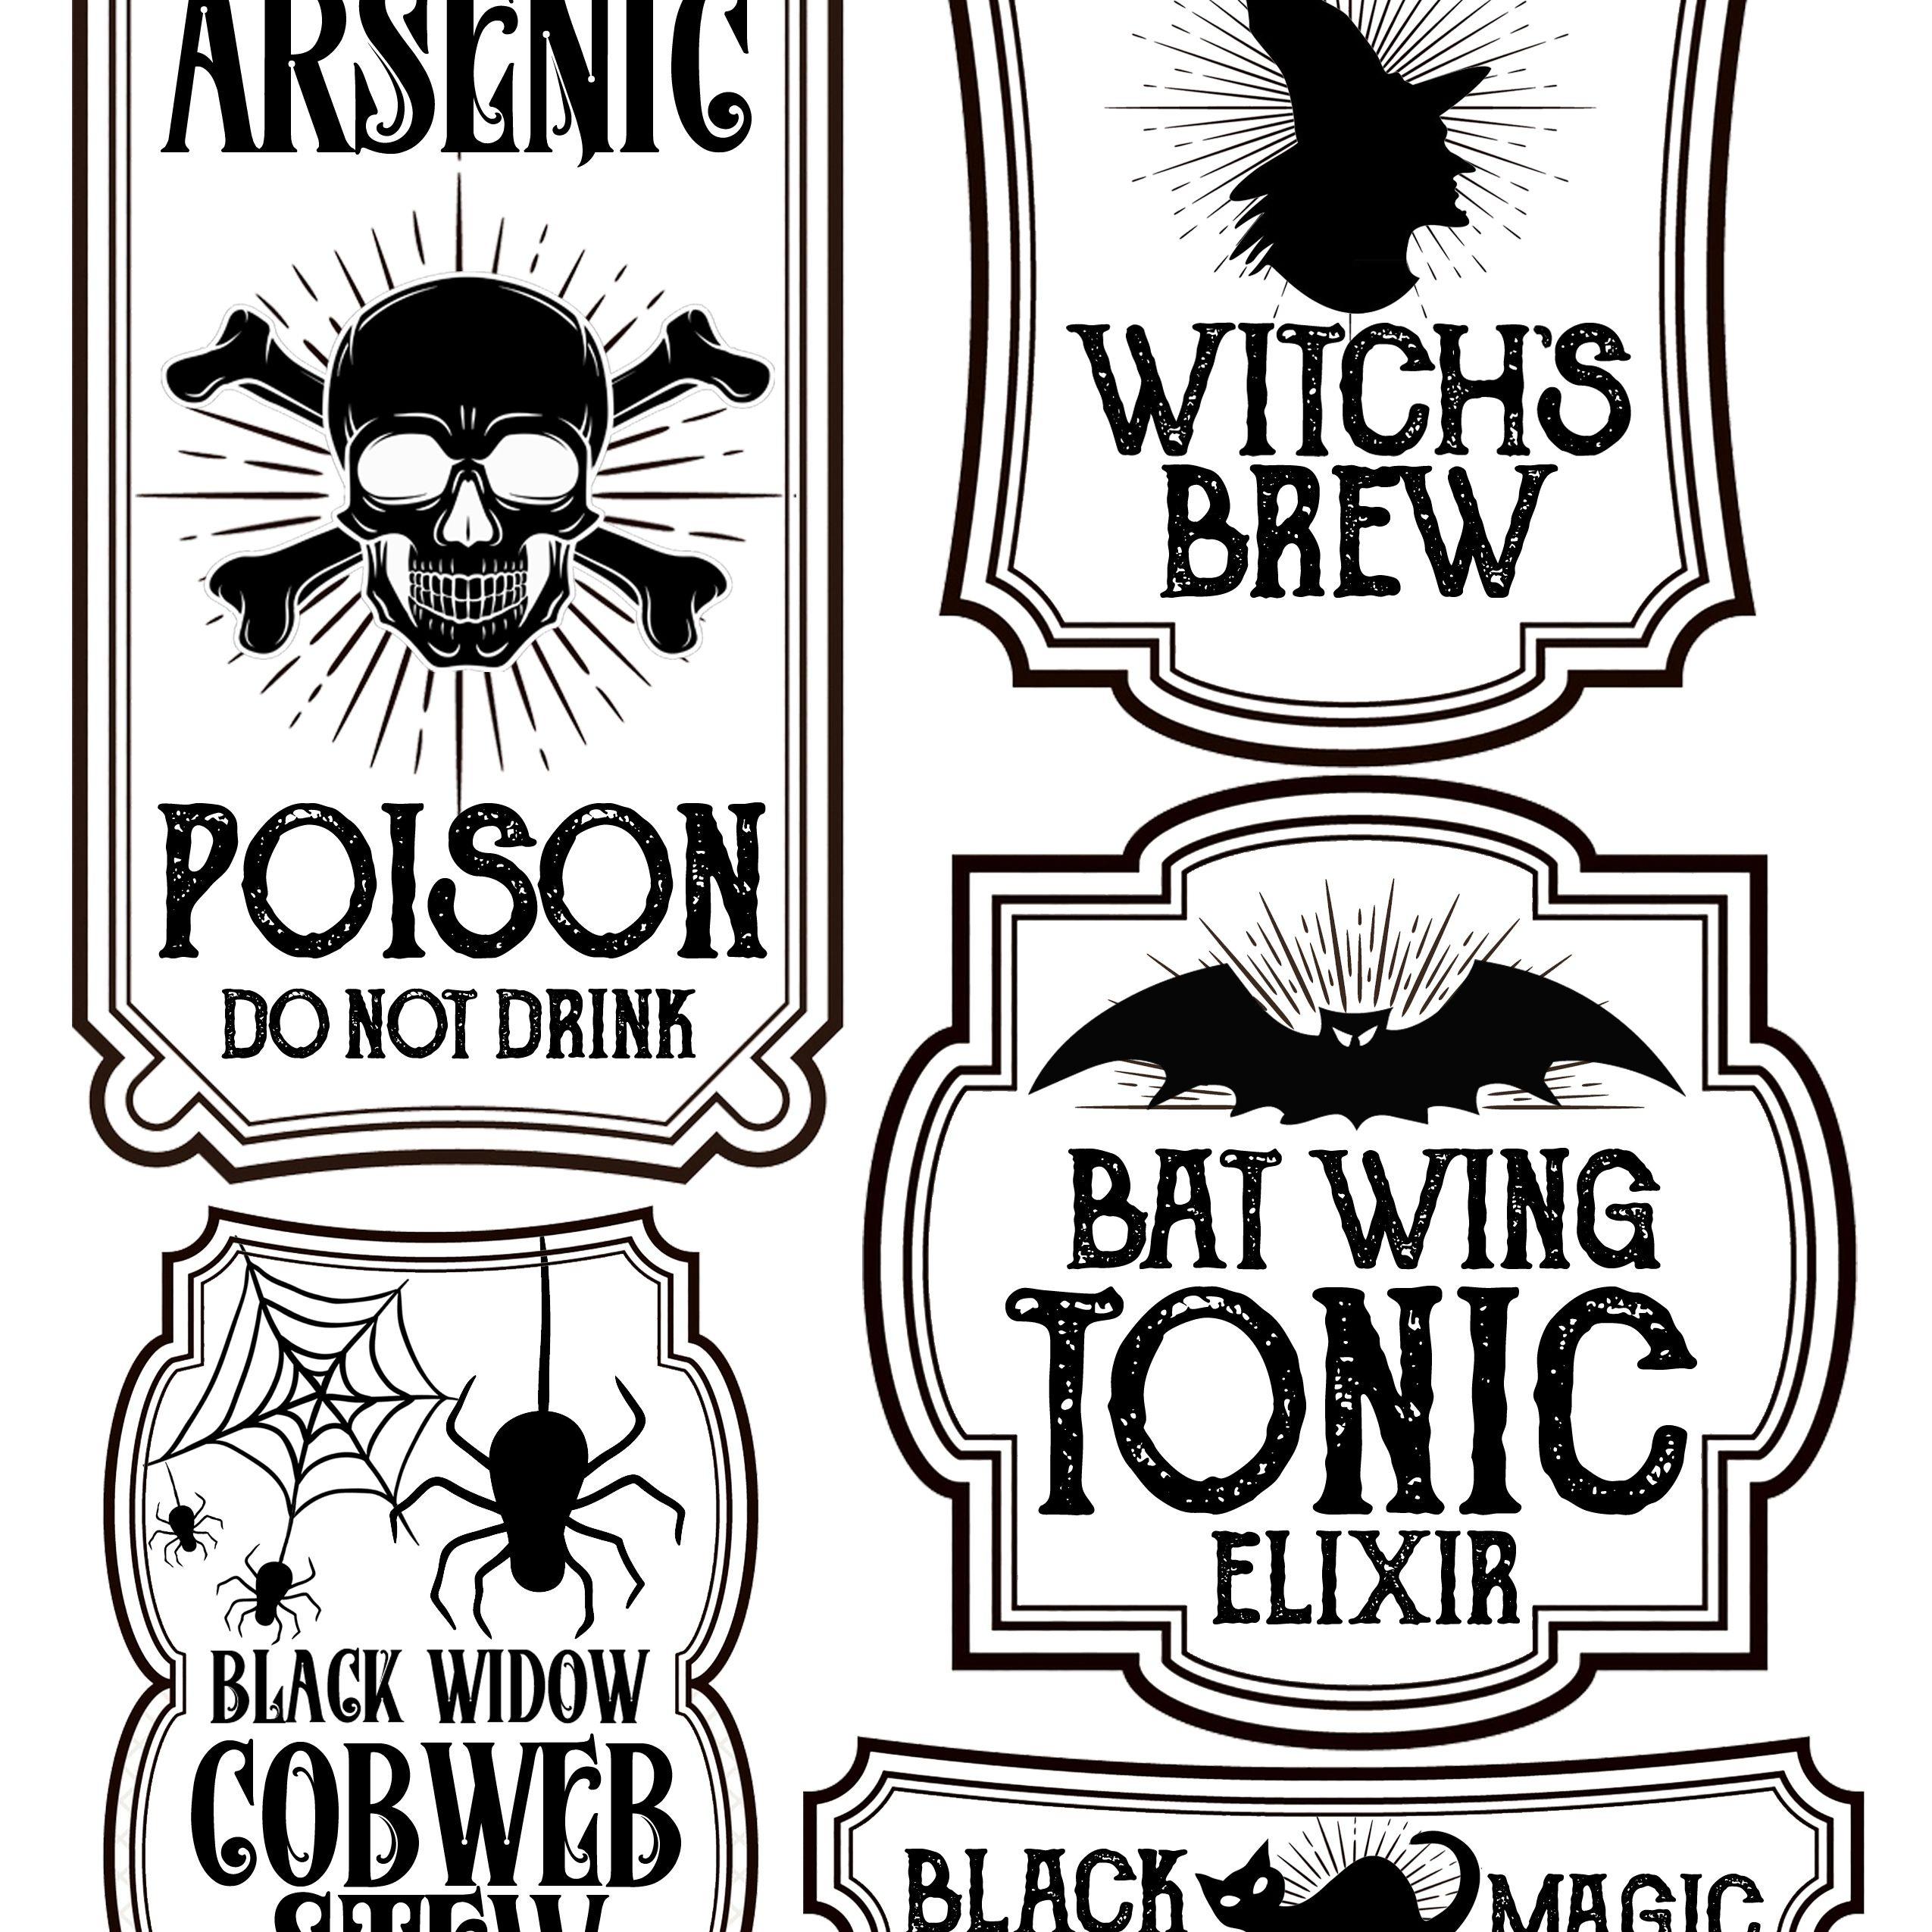 Halloween Bottle Labels - Free Printables - Potions Labels | Art - Free Printable Potion Labels